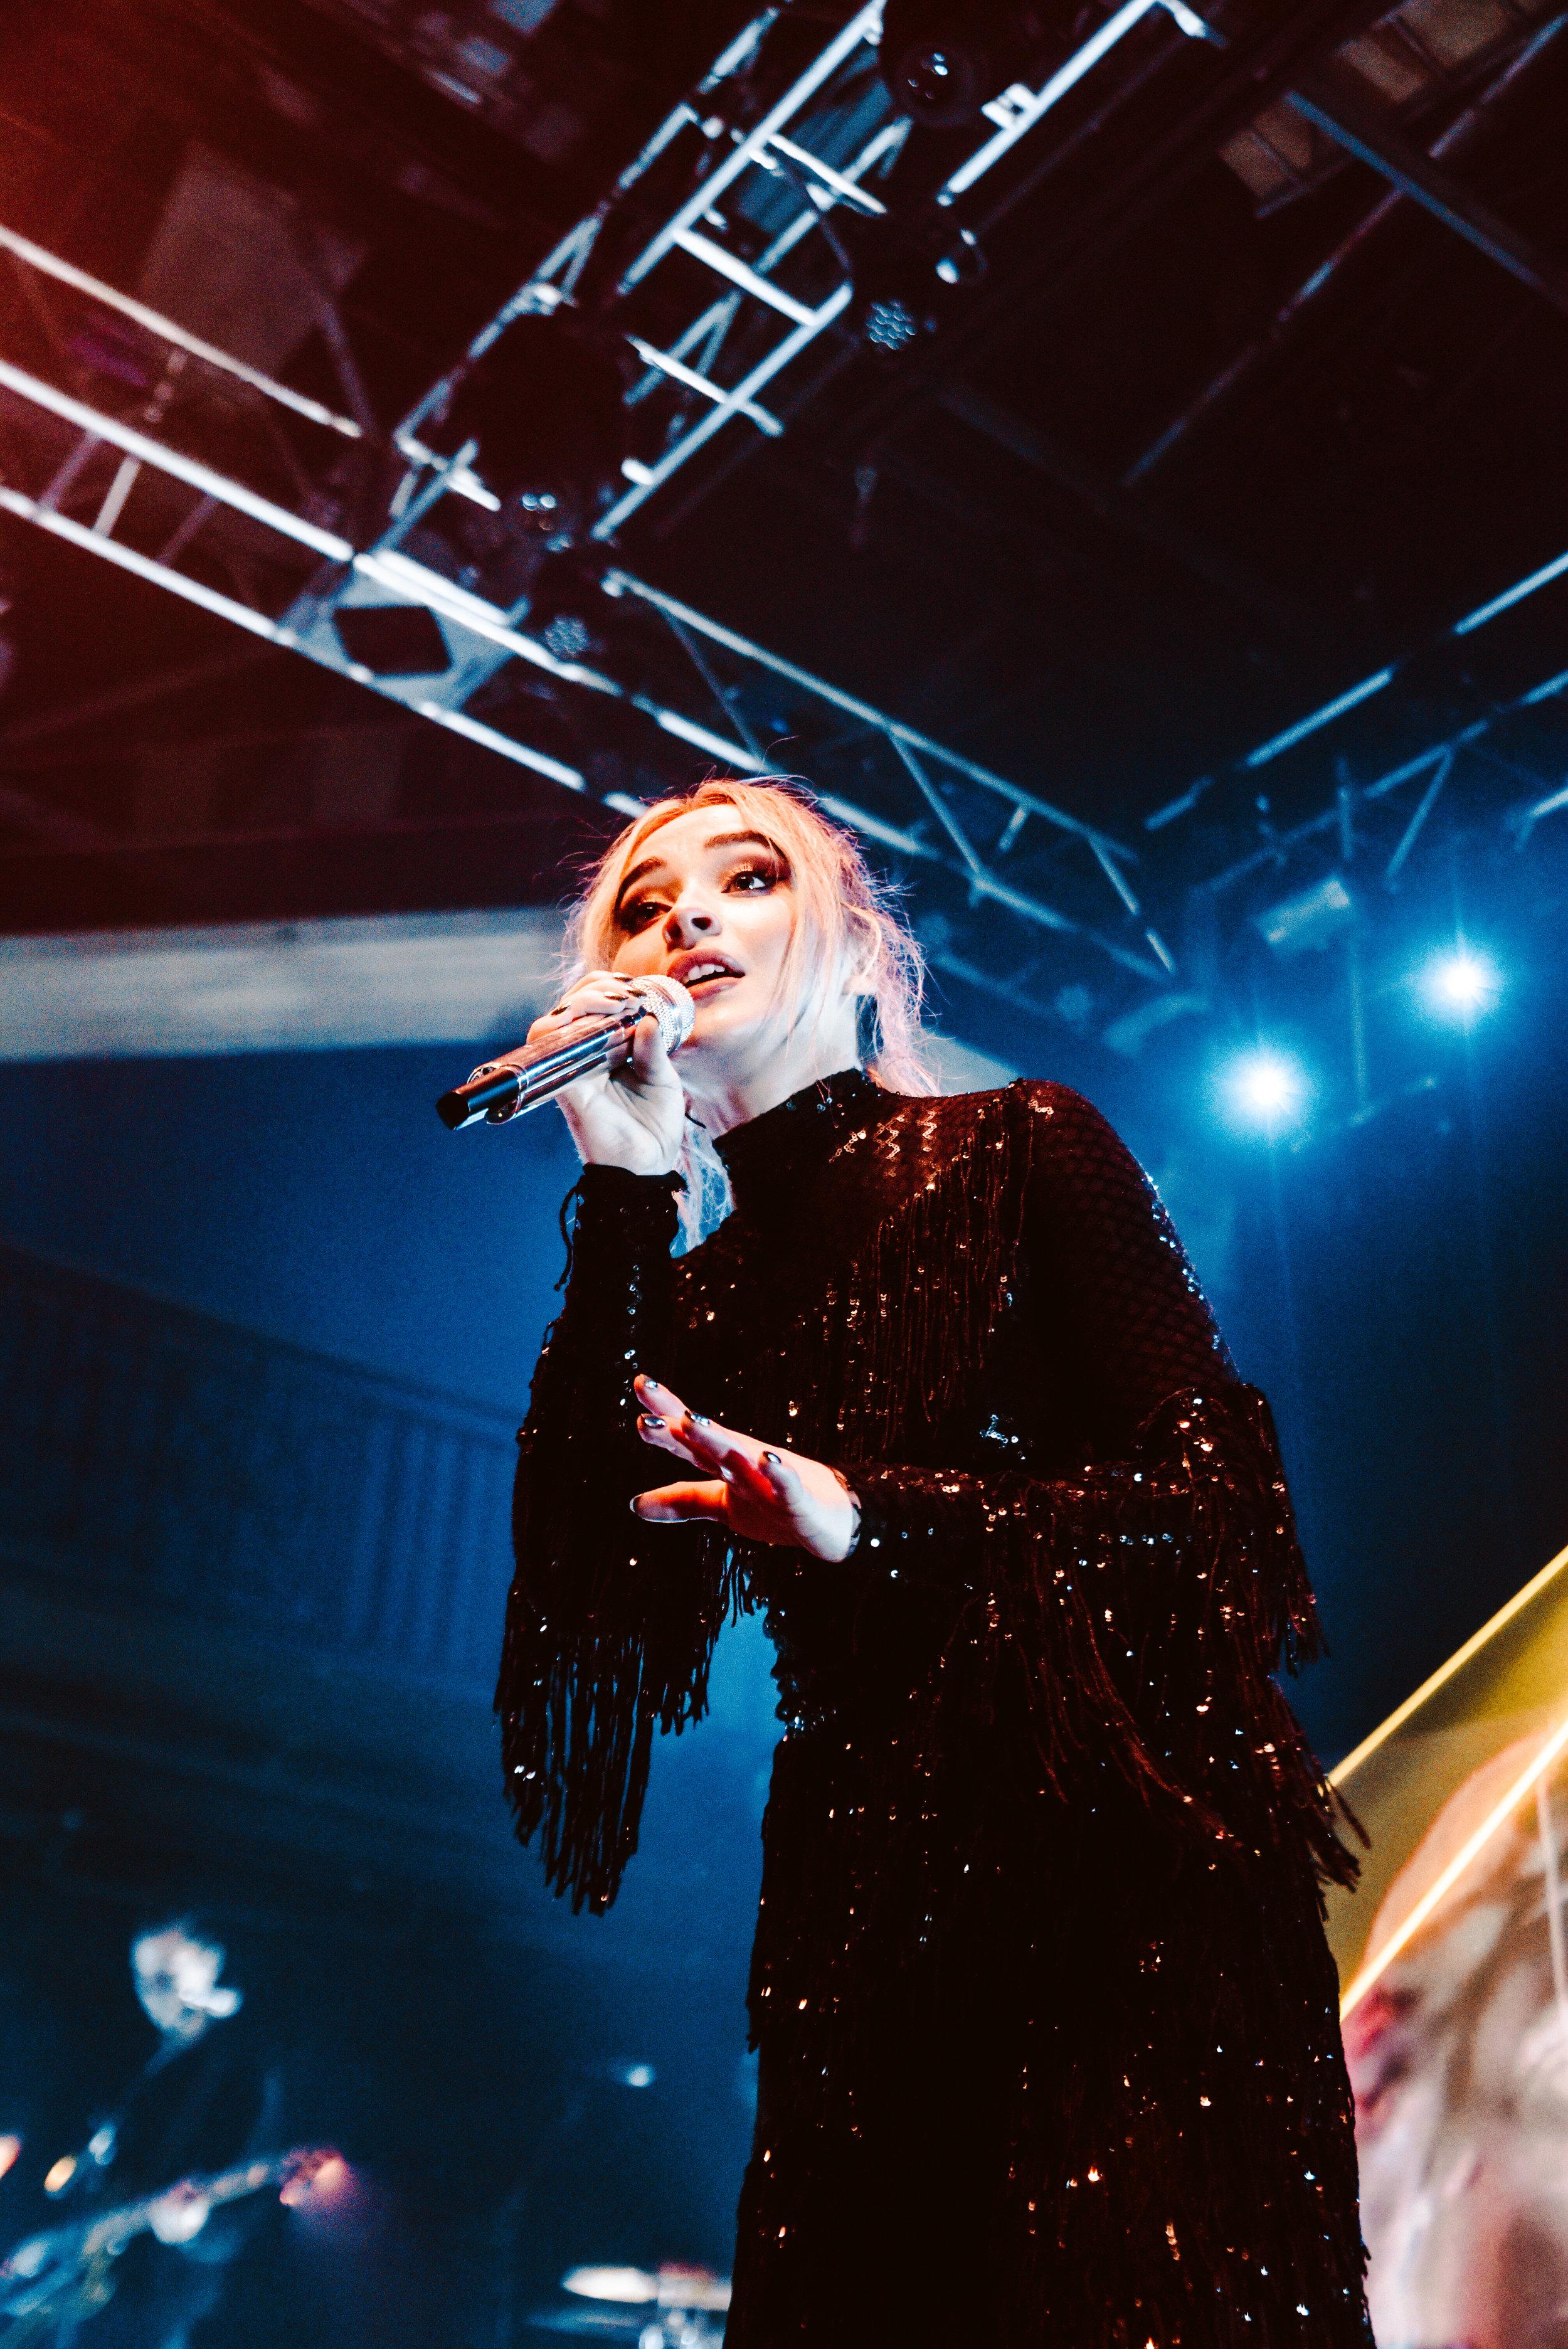 Sabrina Carpenter - 03-10-2019 - Raelena Kniff Media-66.jpg